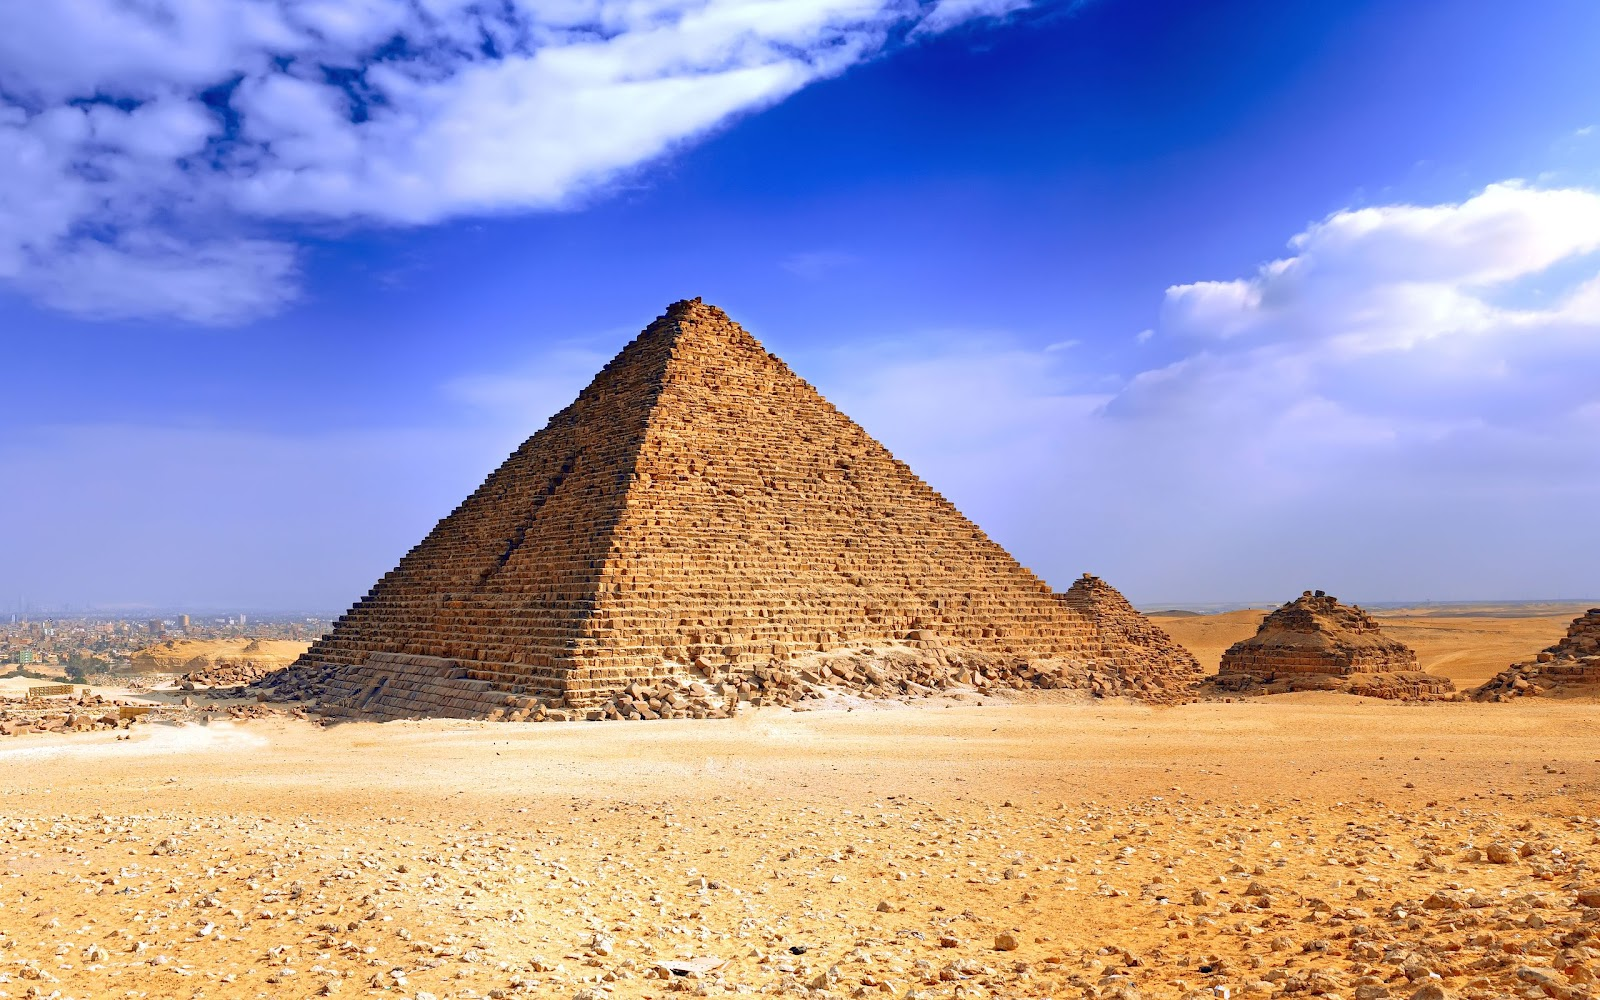 Egypt Pyramids Hd Wallpapers Jessica Alba Hd Iphone Wallpaper 1600x1000